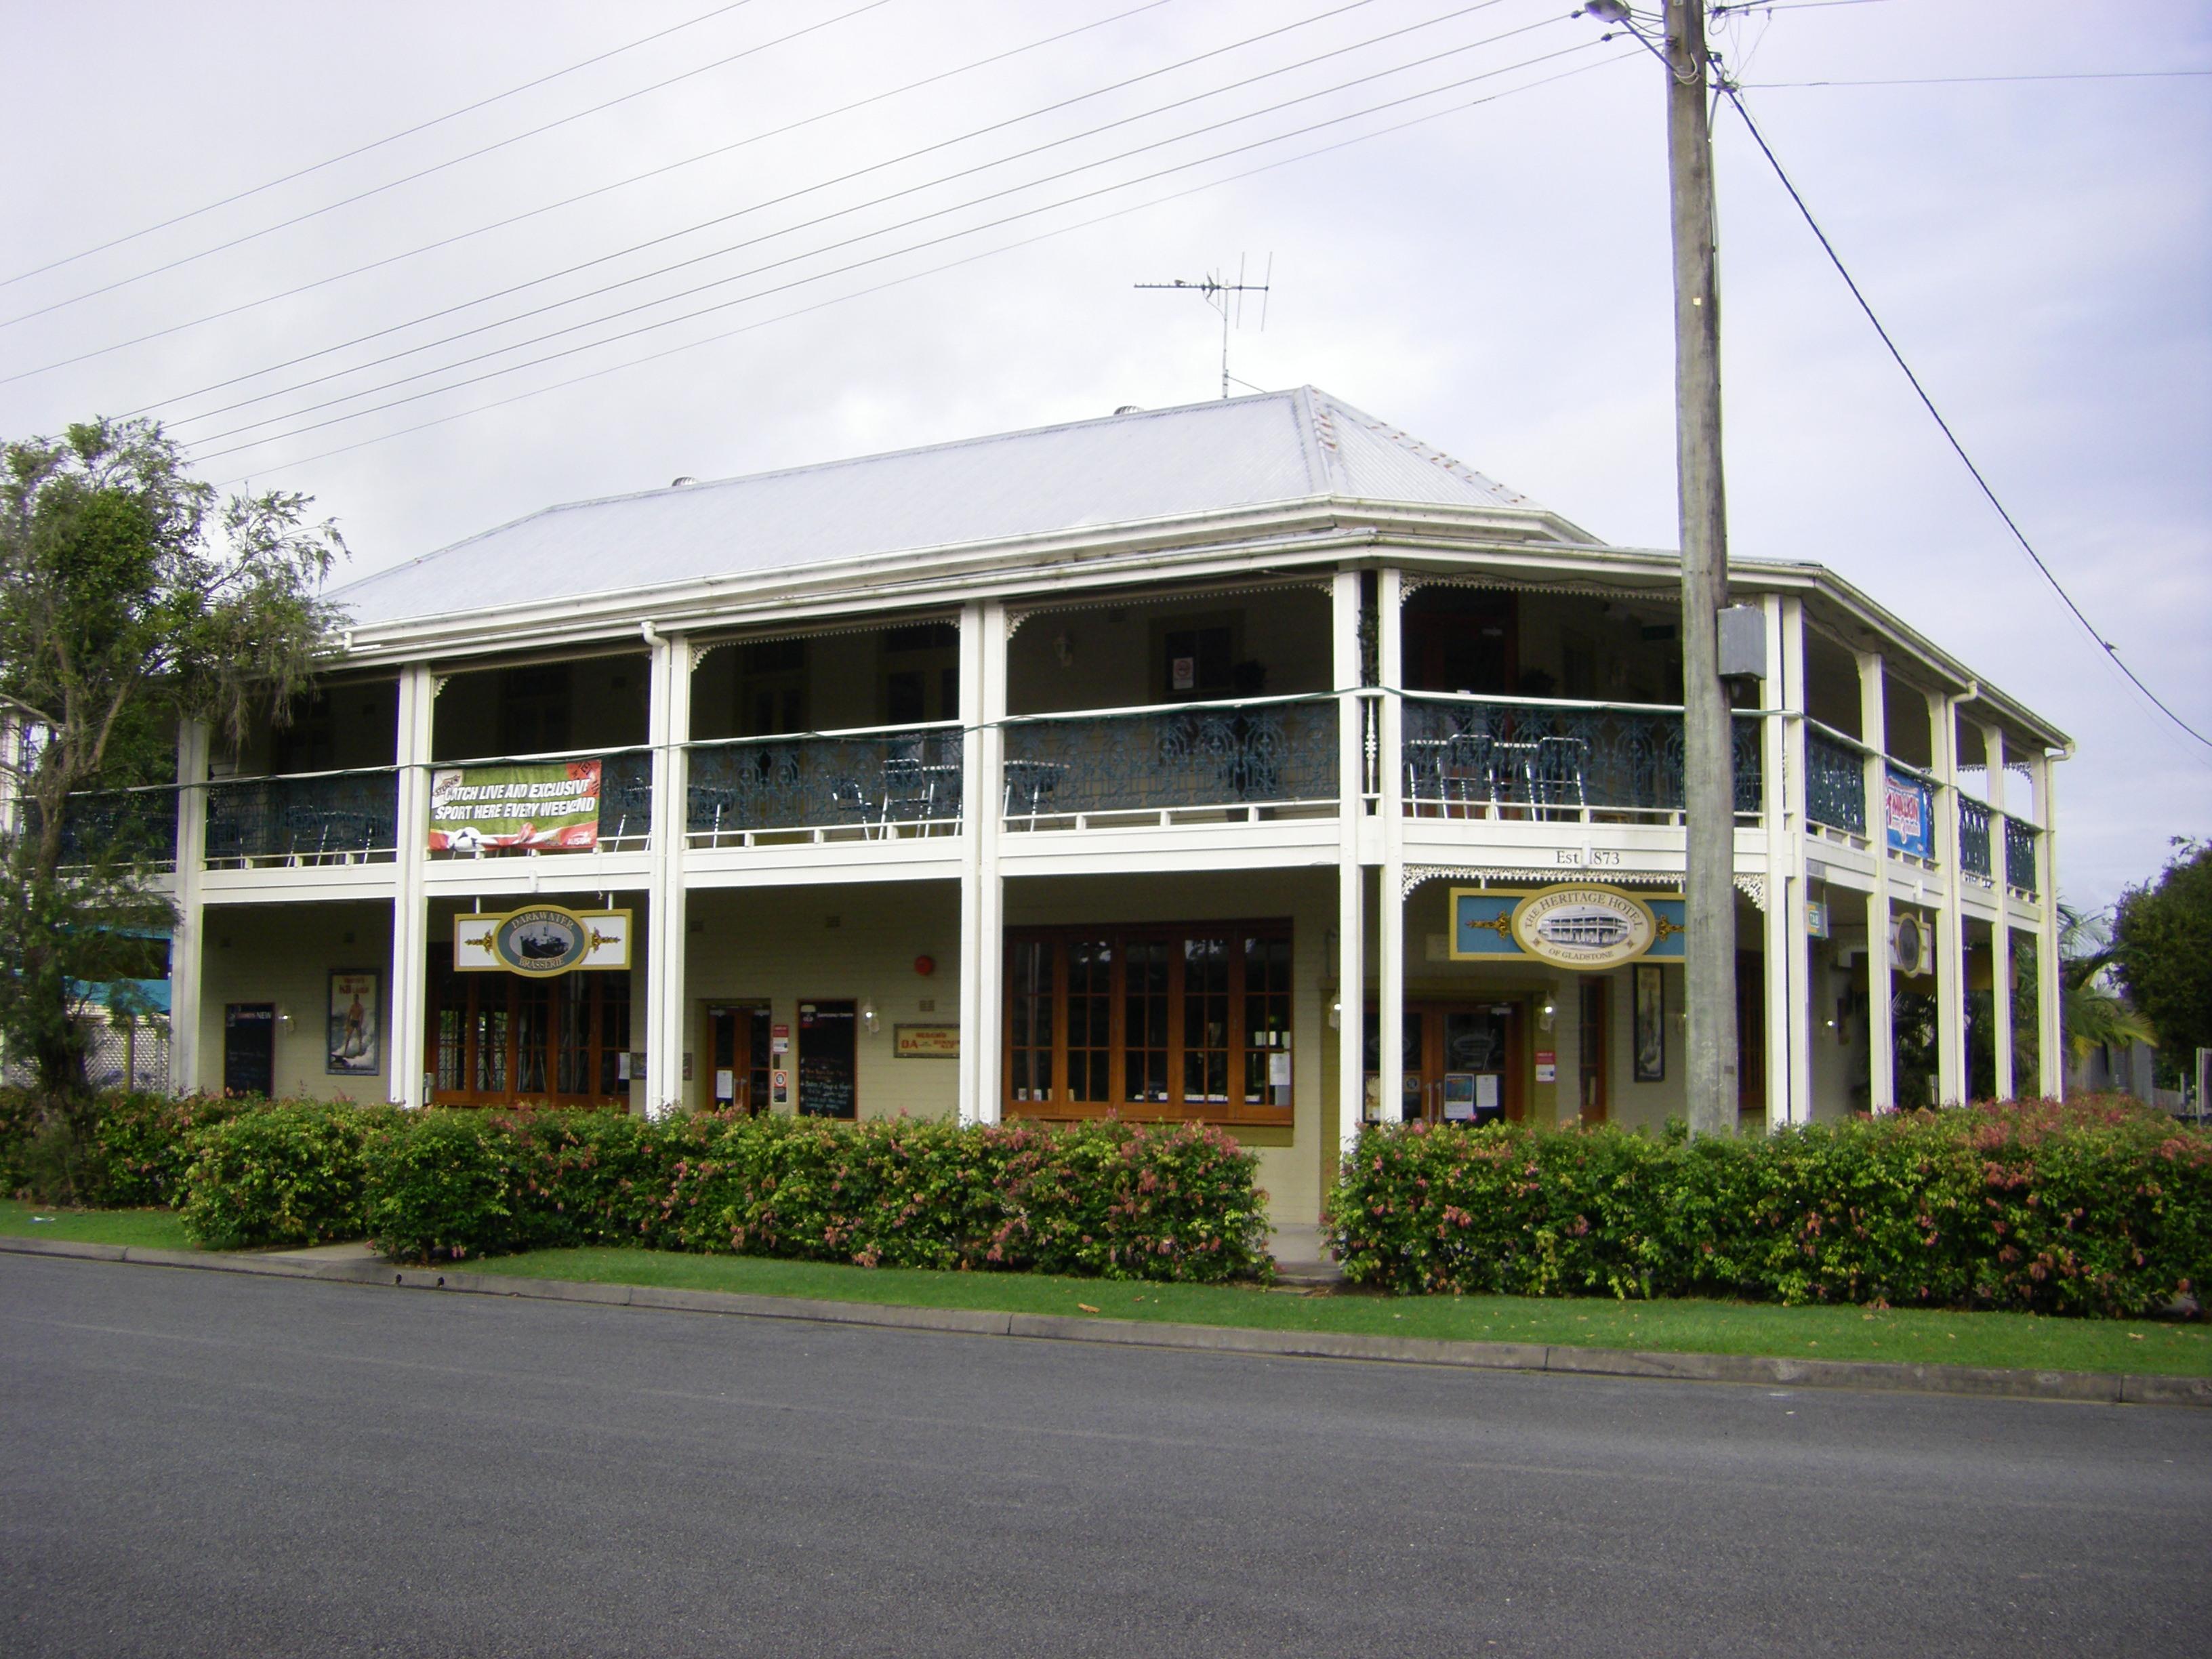 The Heritage Hotel Gladstone